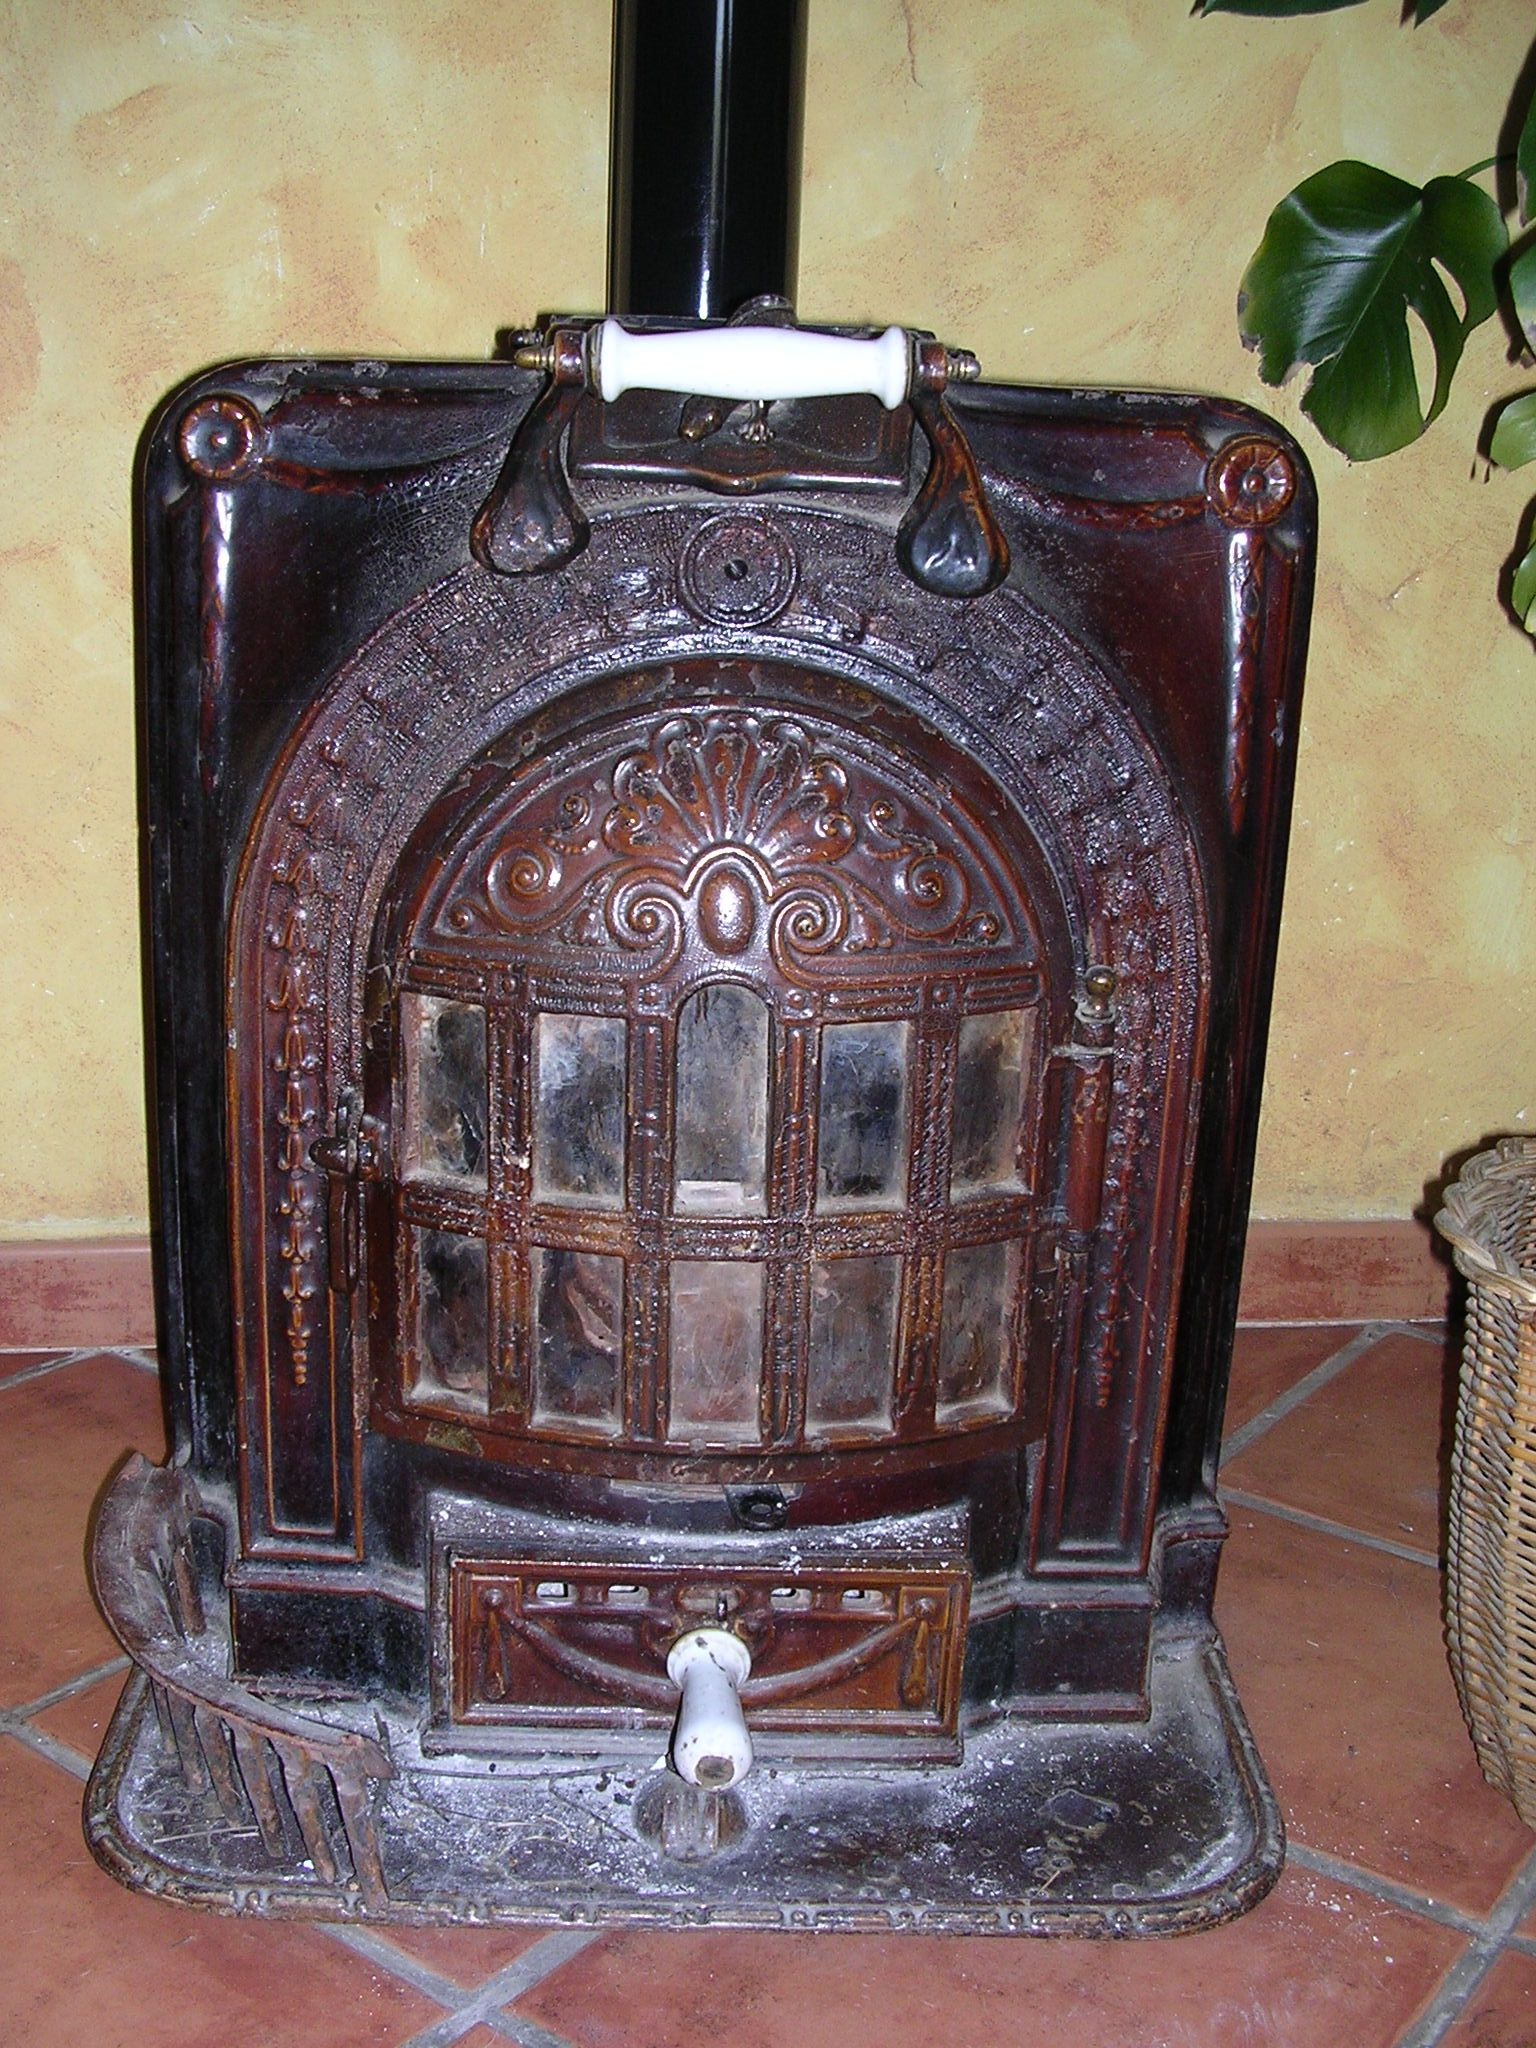 Estufa de le a r stica fournaise et foyer pinterest for Estufa lena calefaccion radiadores